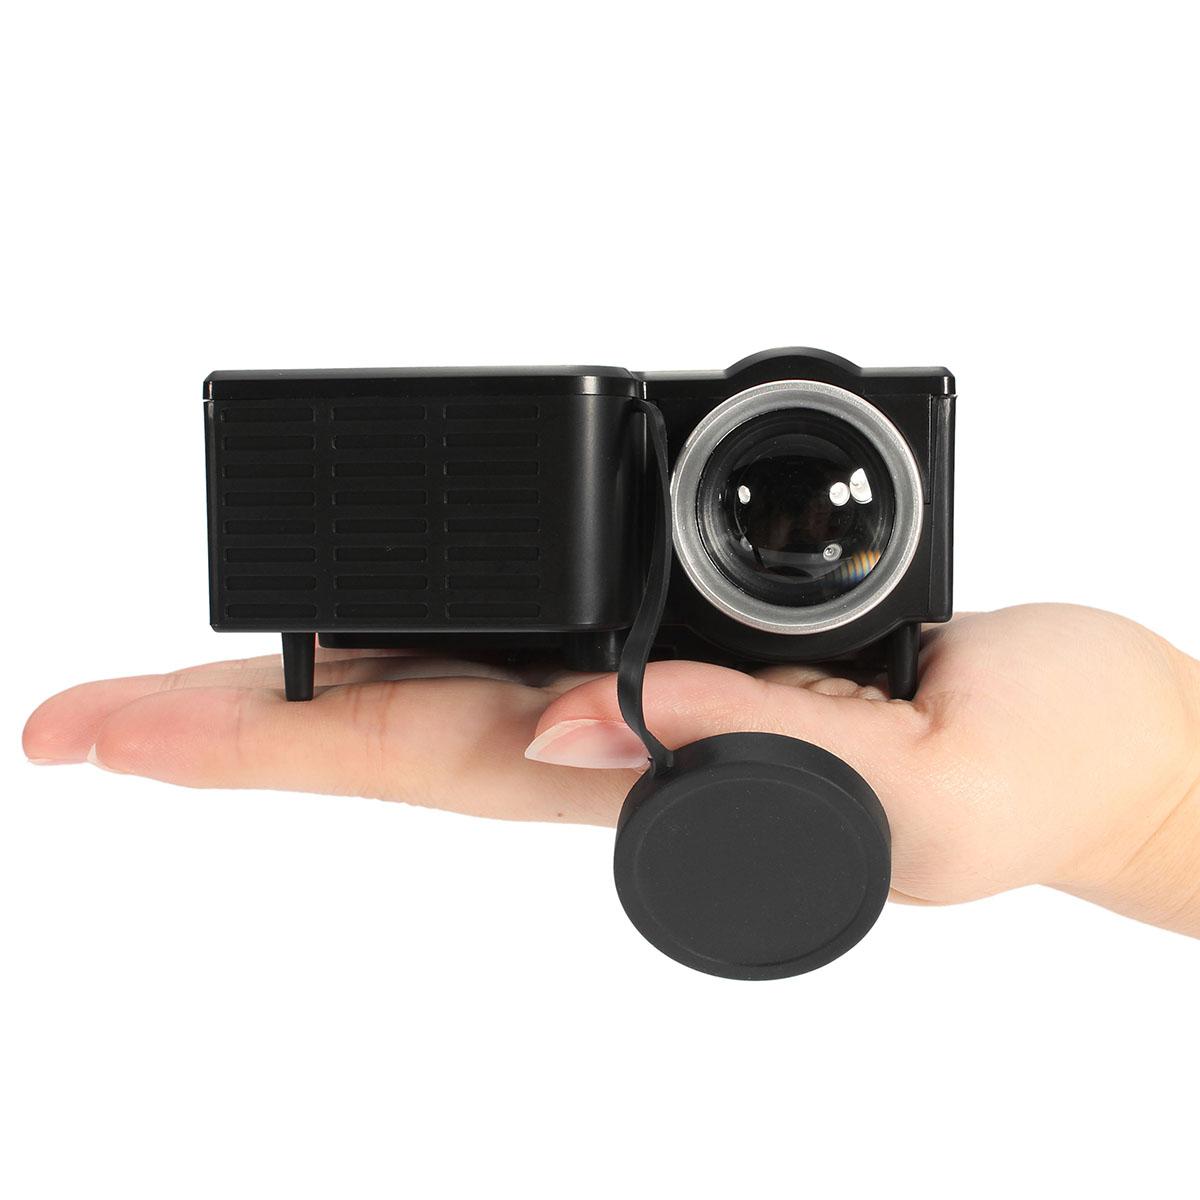 Micro uc28b 400 lumens 1920 x 1080 led mini multimedia for Mini usb projector for mobile